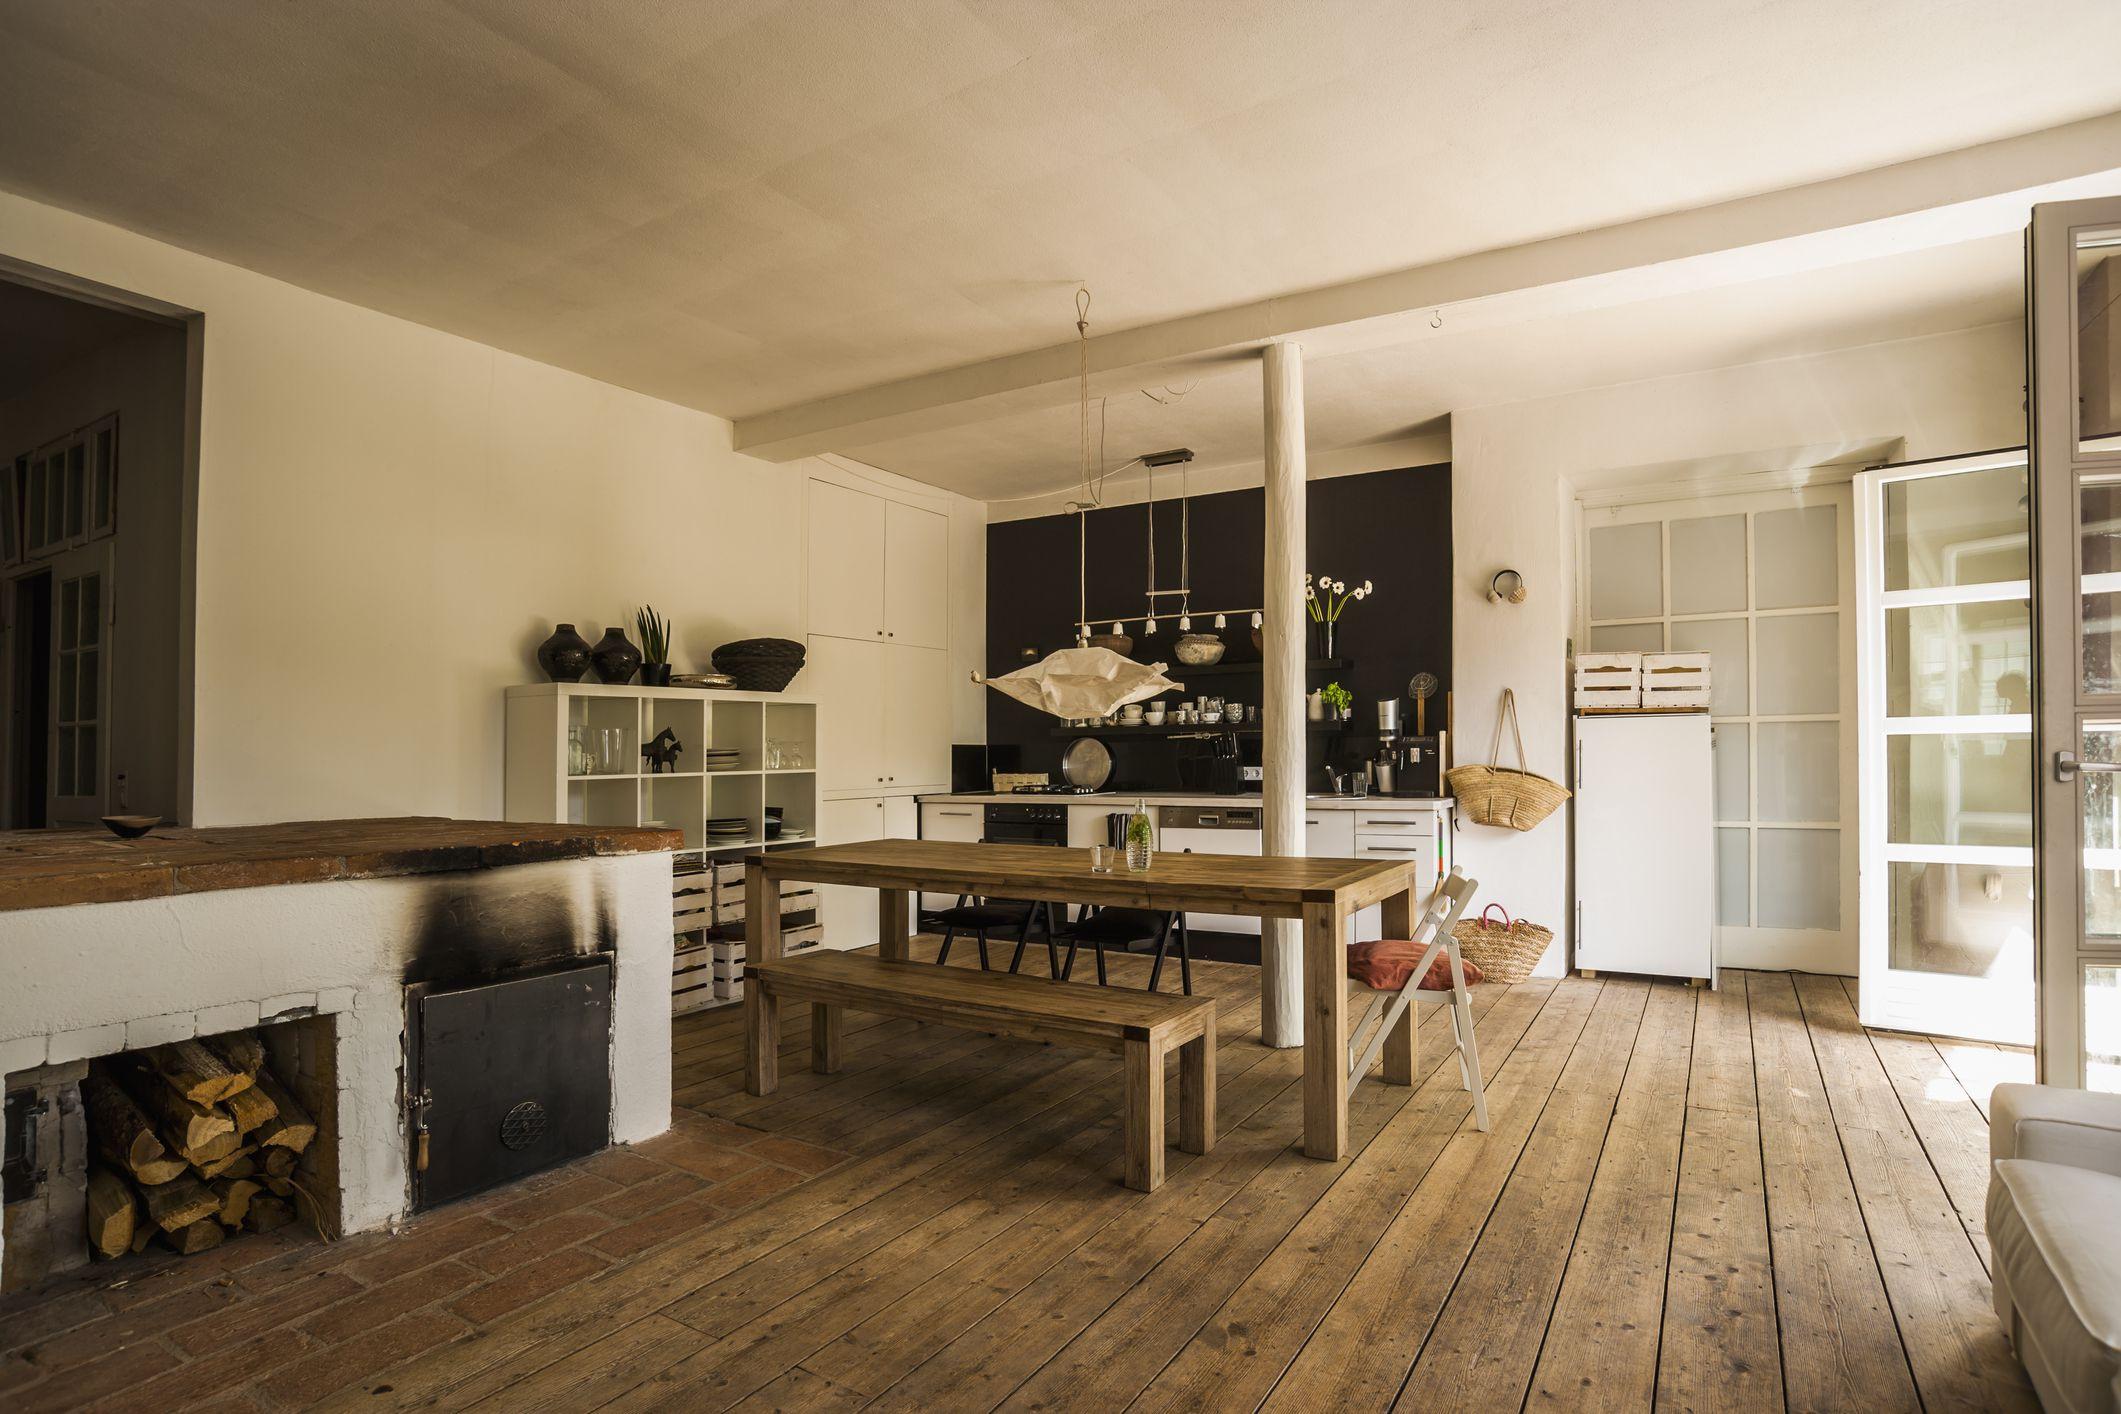 is bamboo flooring cheaper than hardwood of vinyl wood flooring versus natural hardwood intended for diningroom woodenfloor gettyimages 544546775 590e57565f9b58647043440a